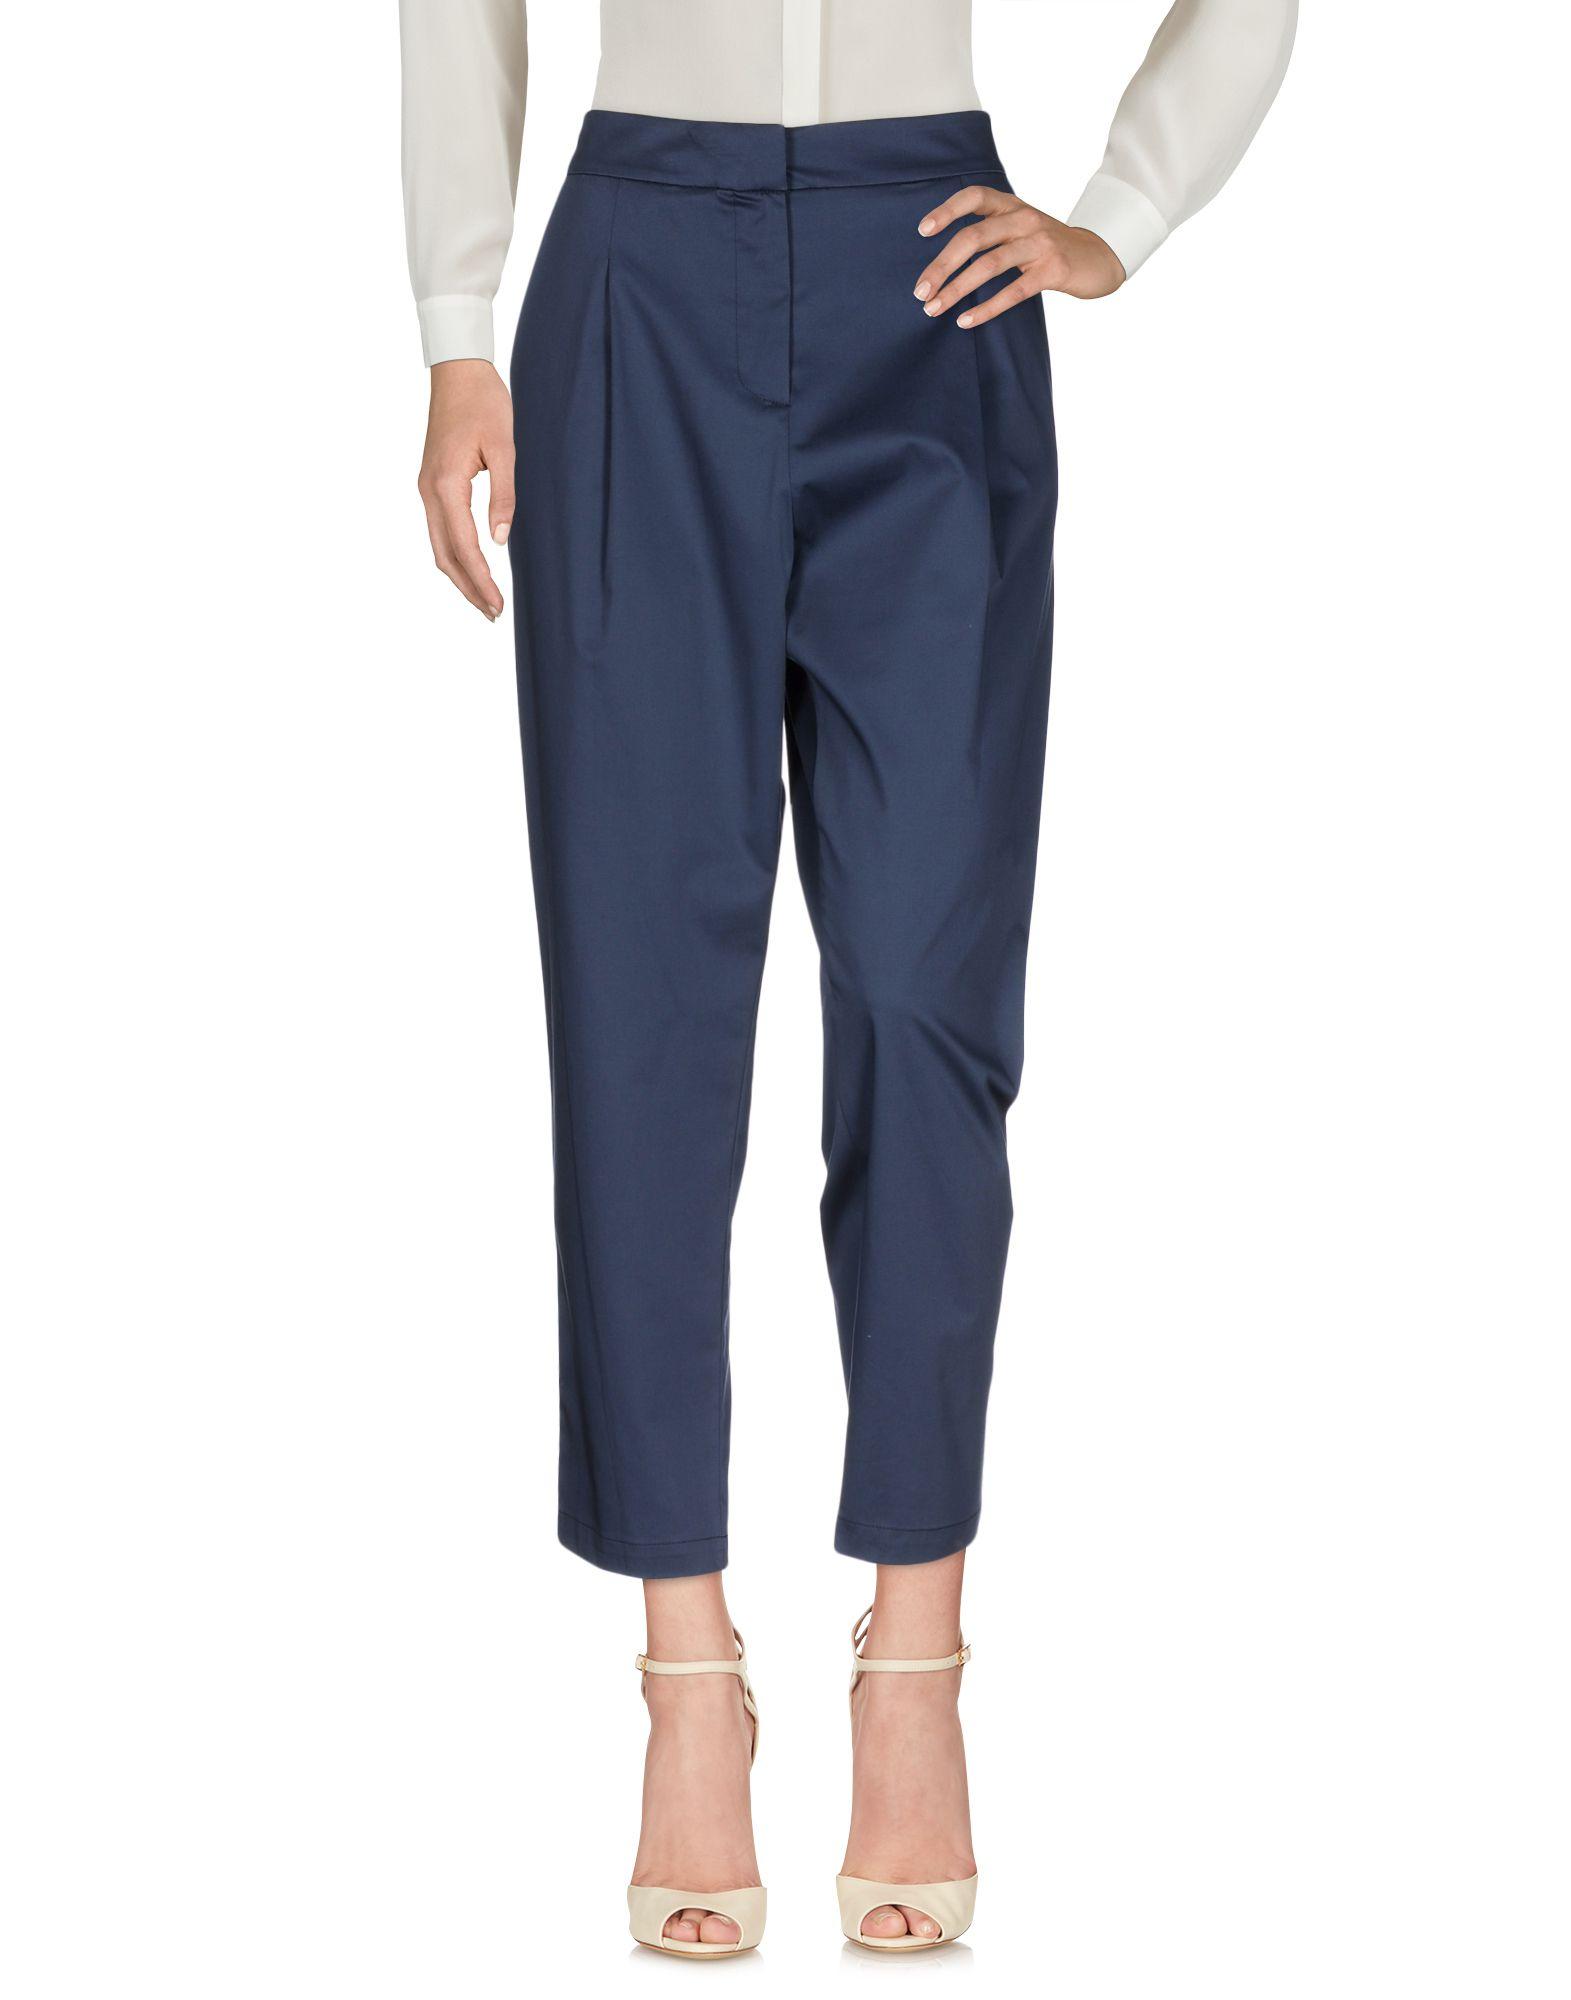 ANIYE BY Damen Hose Farbe Blau Größe 6